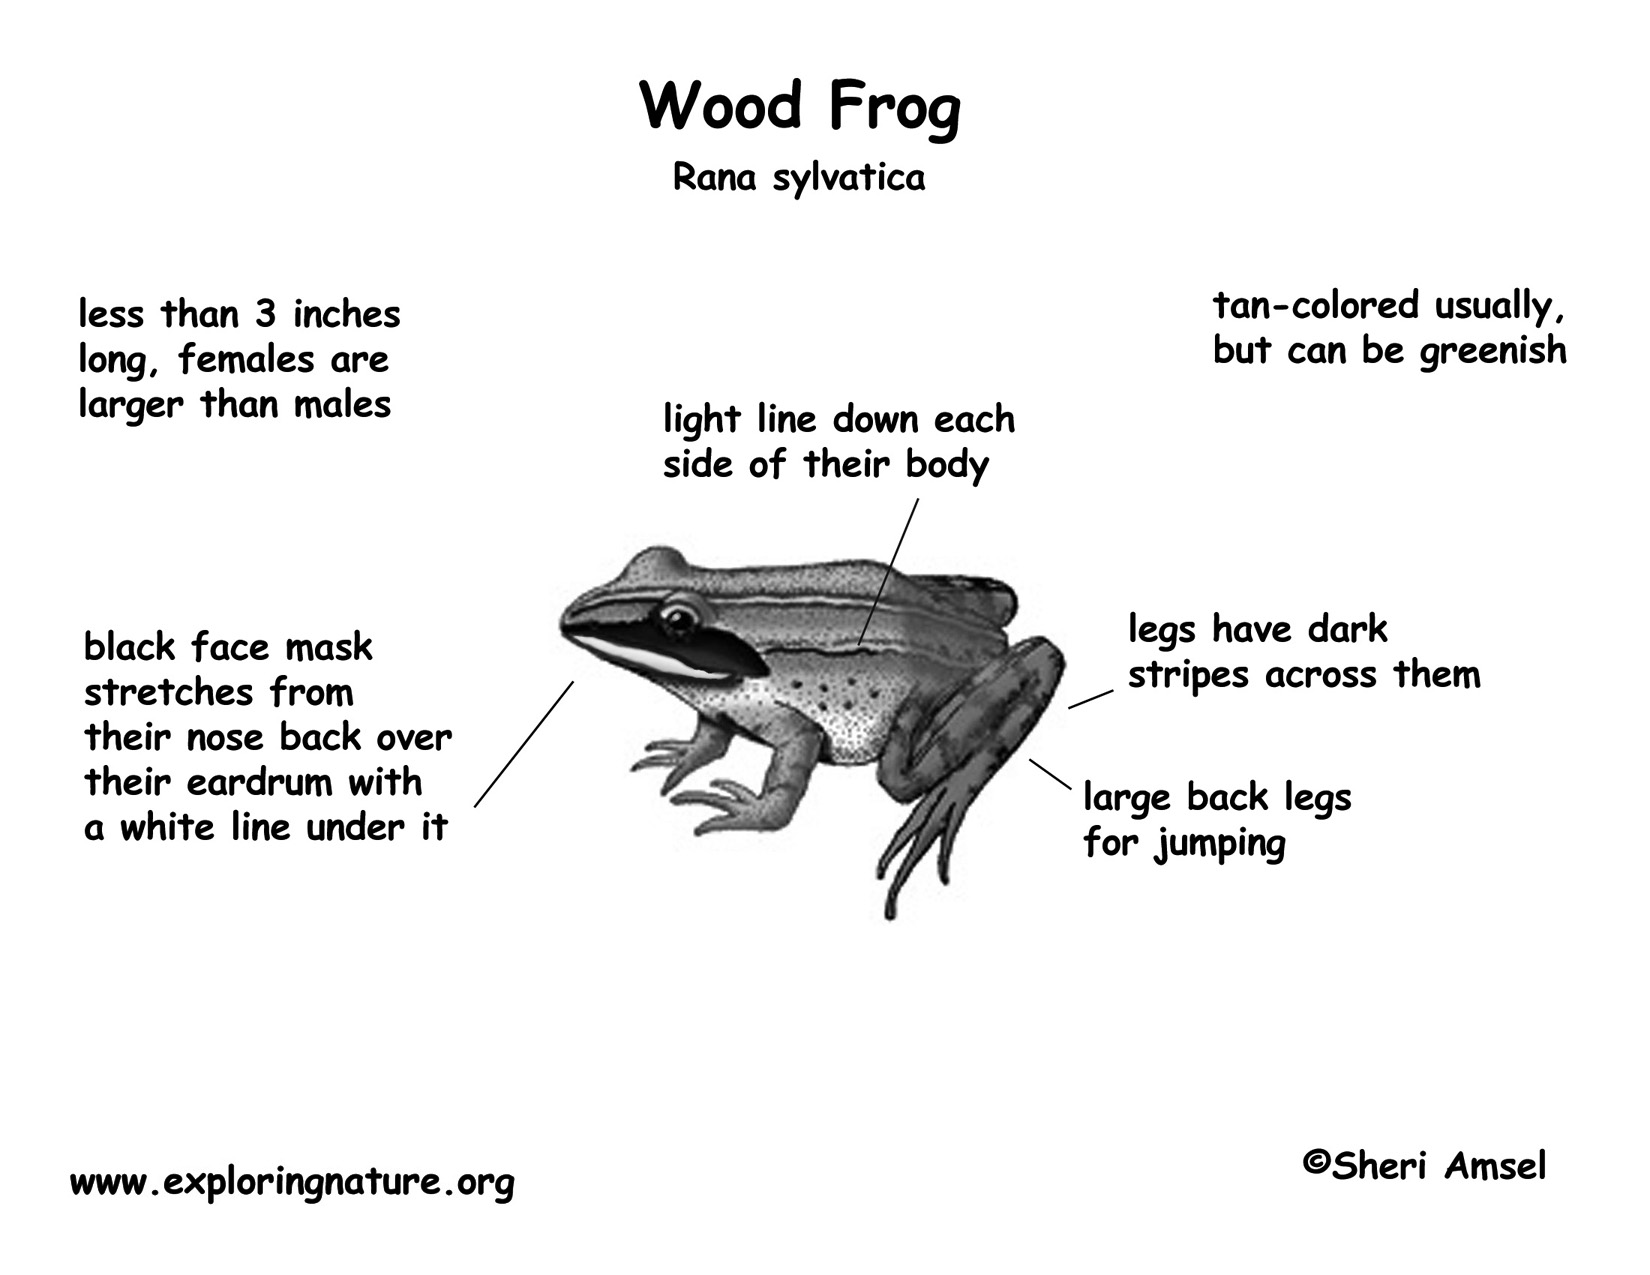 Frog wood download hi res bw diagram pooptronica